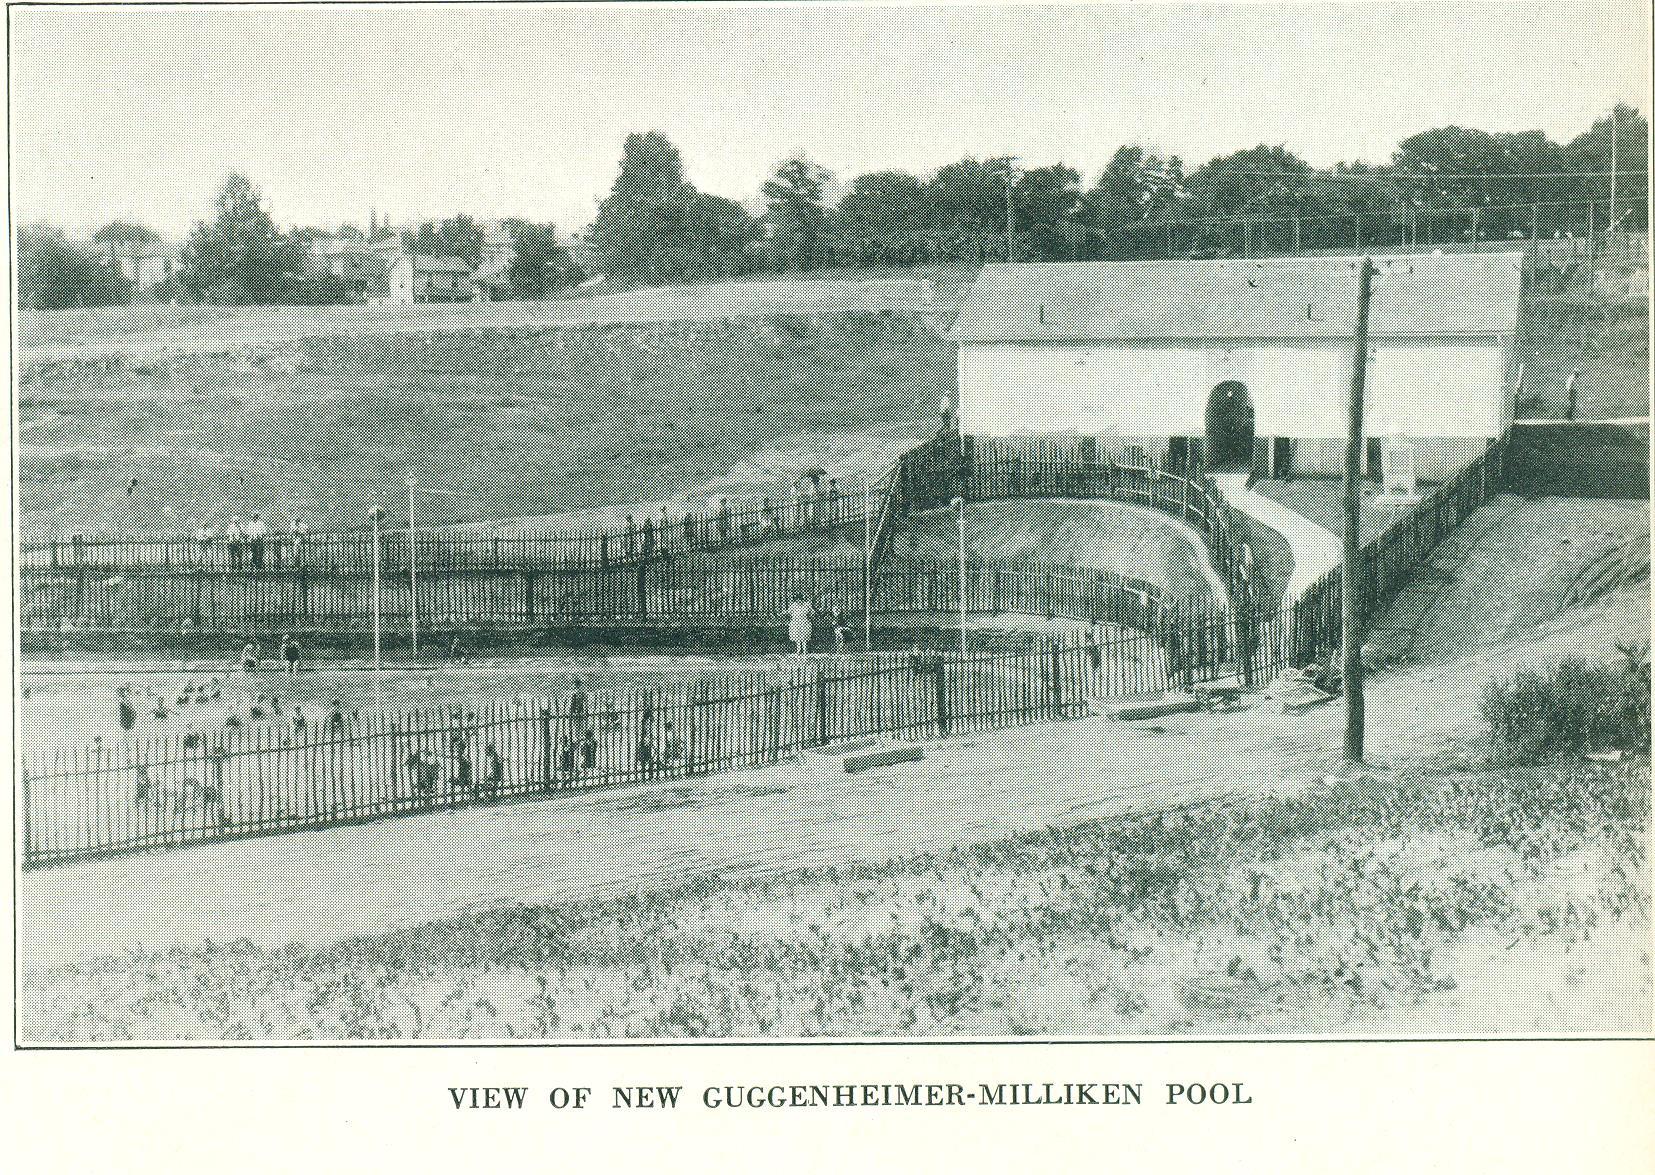 The Guggenheimer-Milliken Pool when it opened in 1927.